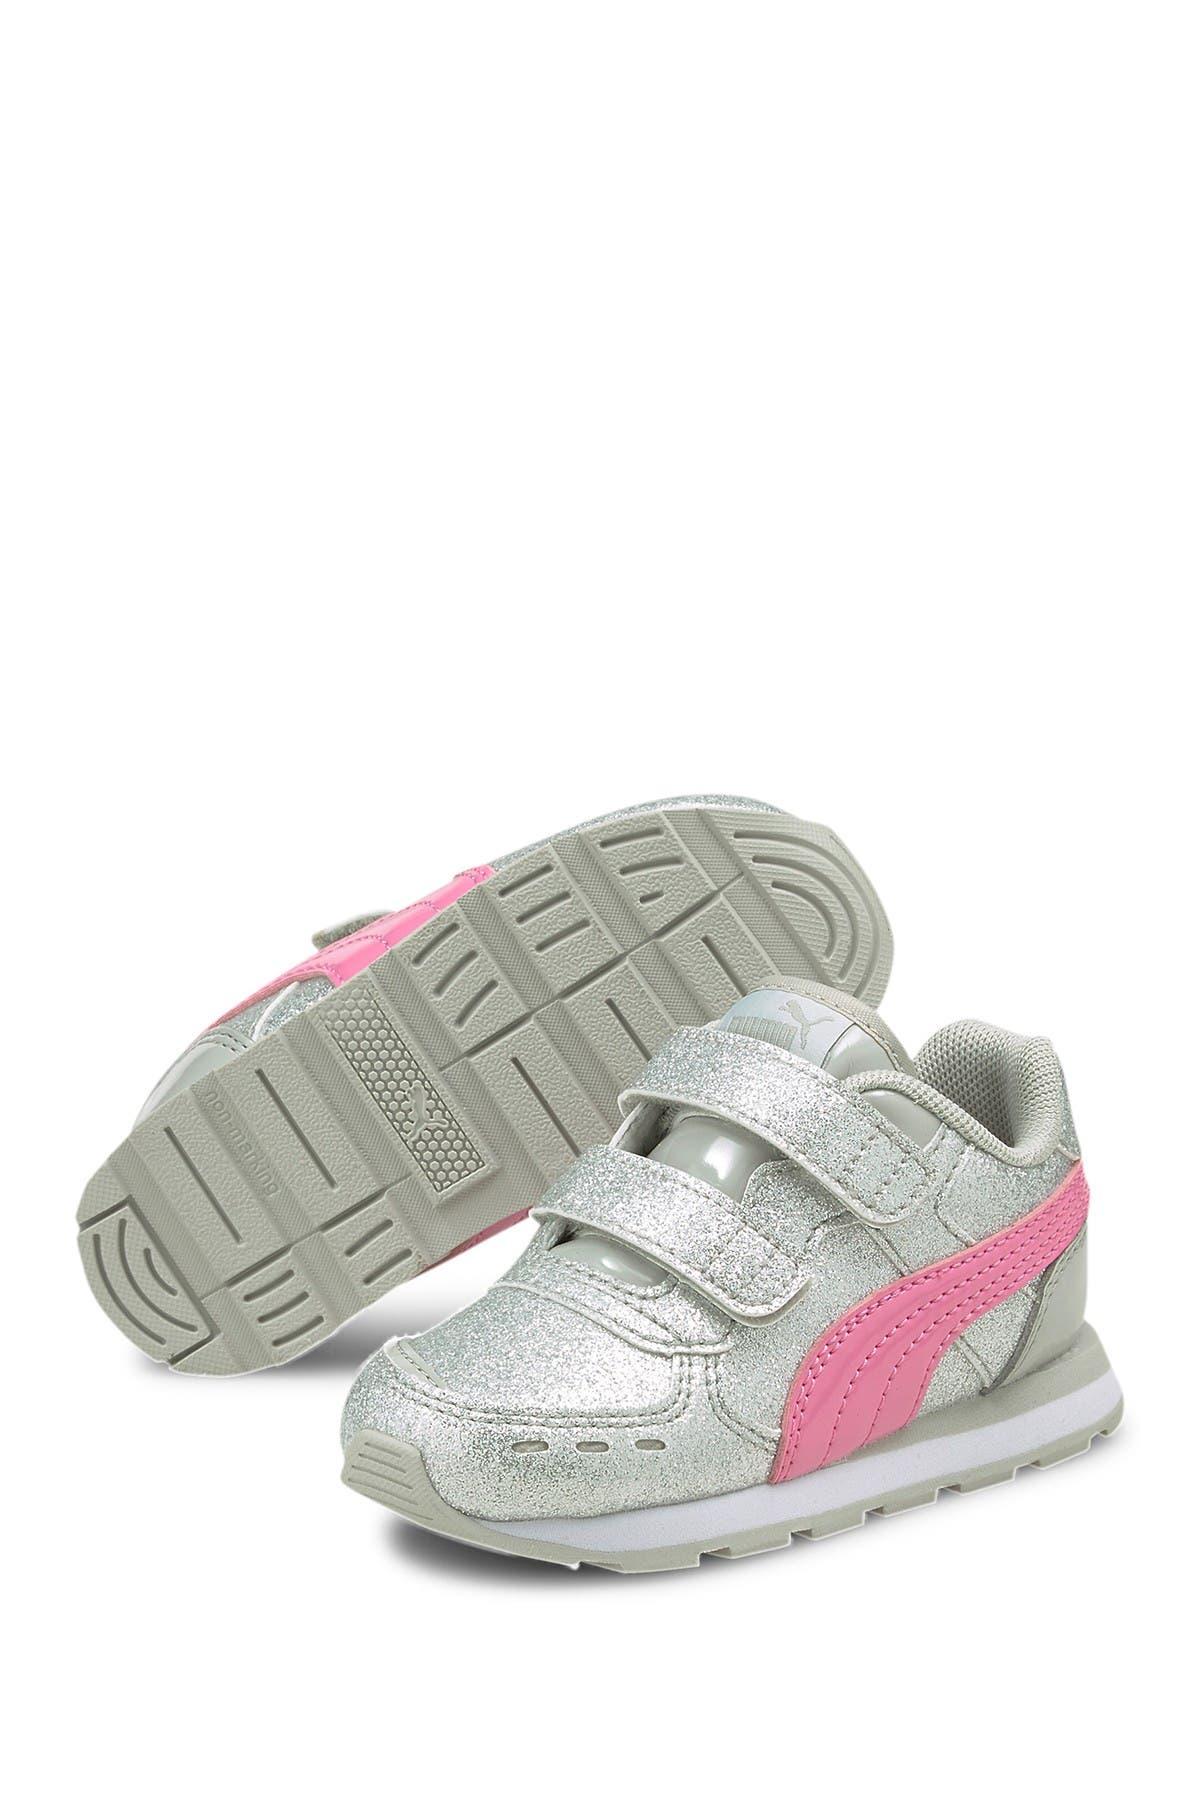 Image of PUMA Vista Glitz V Sneaker